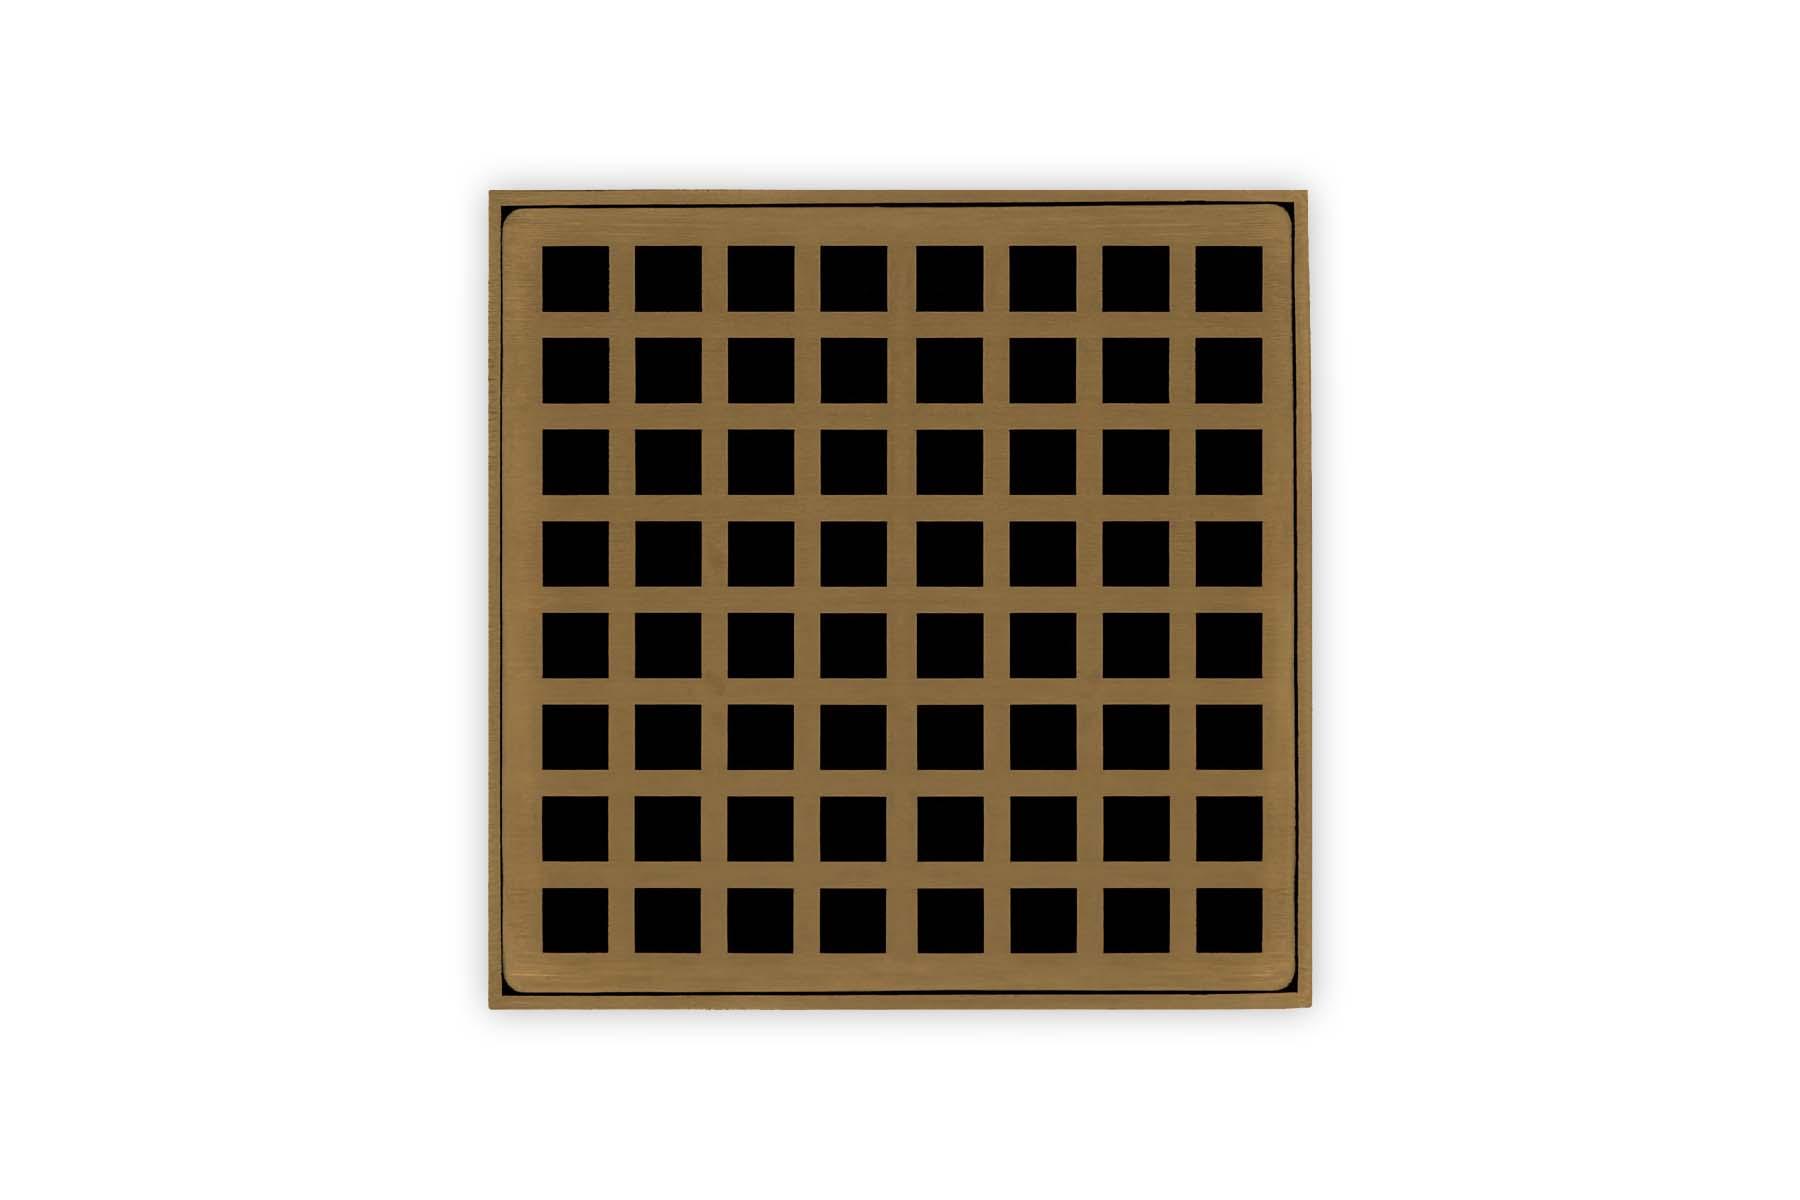 Squares Qd 5 2 5x5 Standard Kit